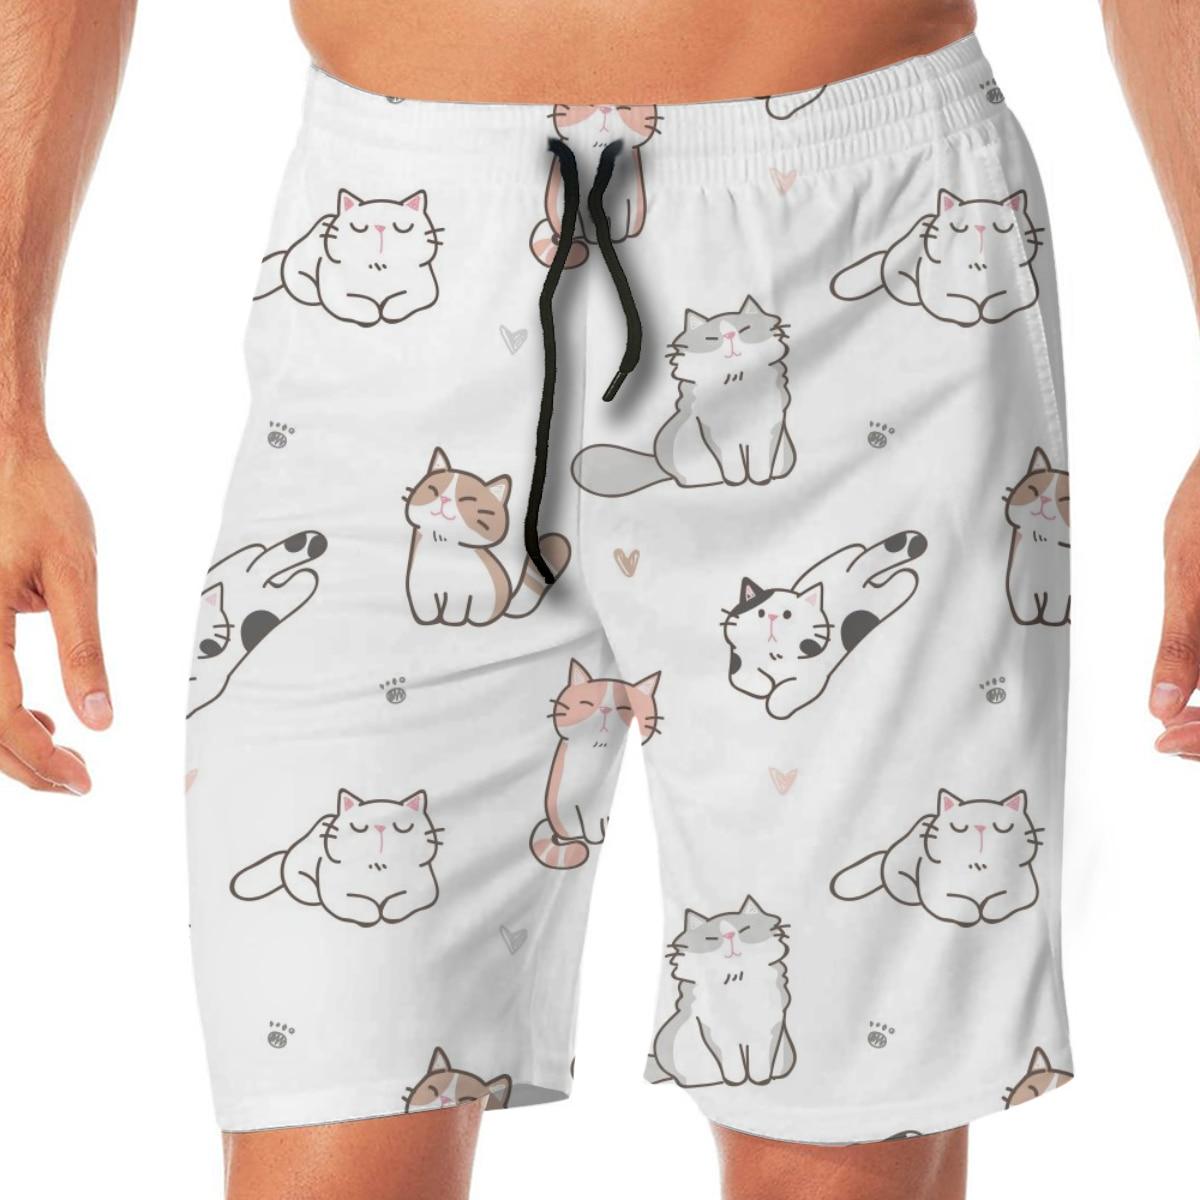 Cartoon Cat Paw Heart Men's Beach Pants Quick Drying Beach Shorts Swimming Surfing Boating Water Sports Trunks Swimwear Shorts